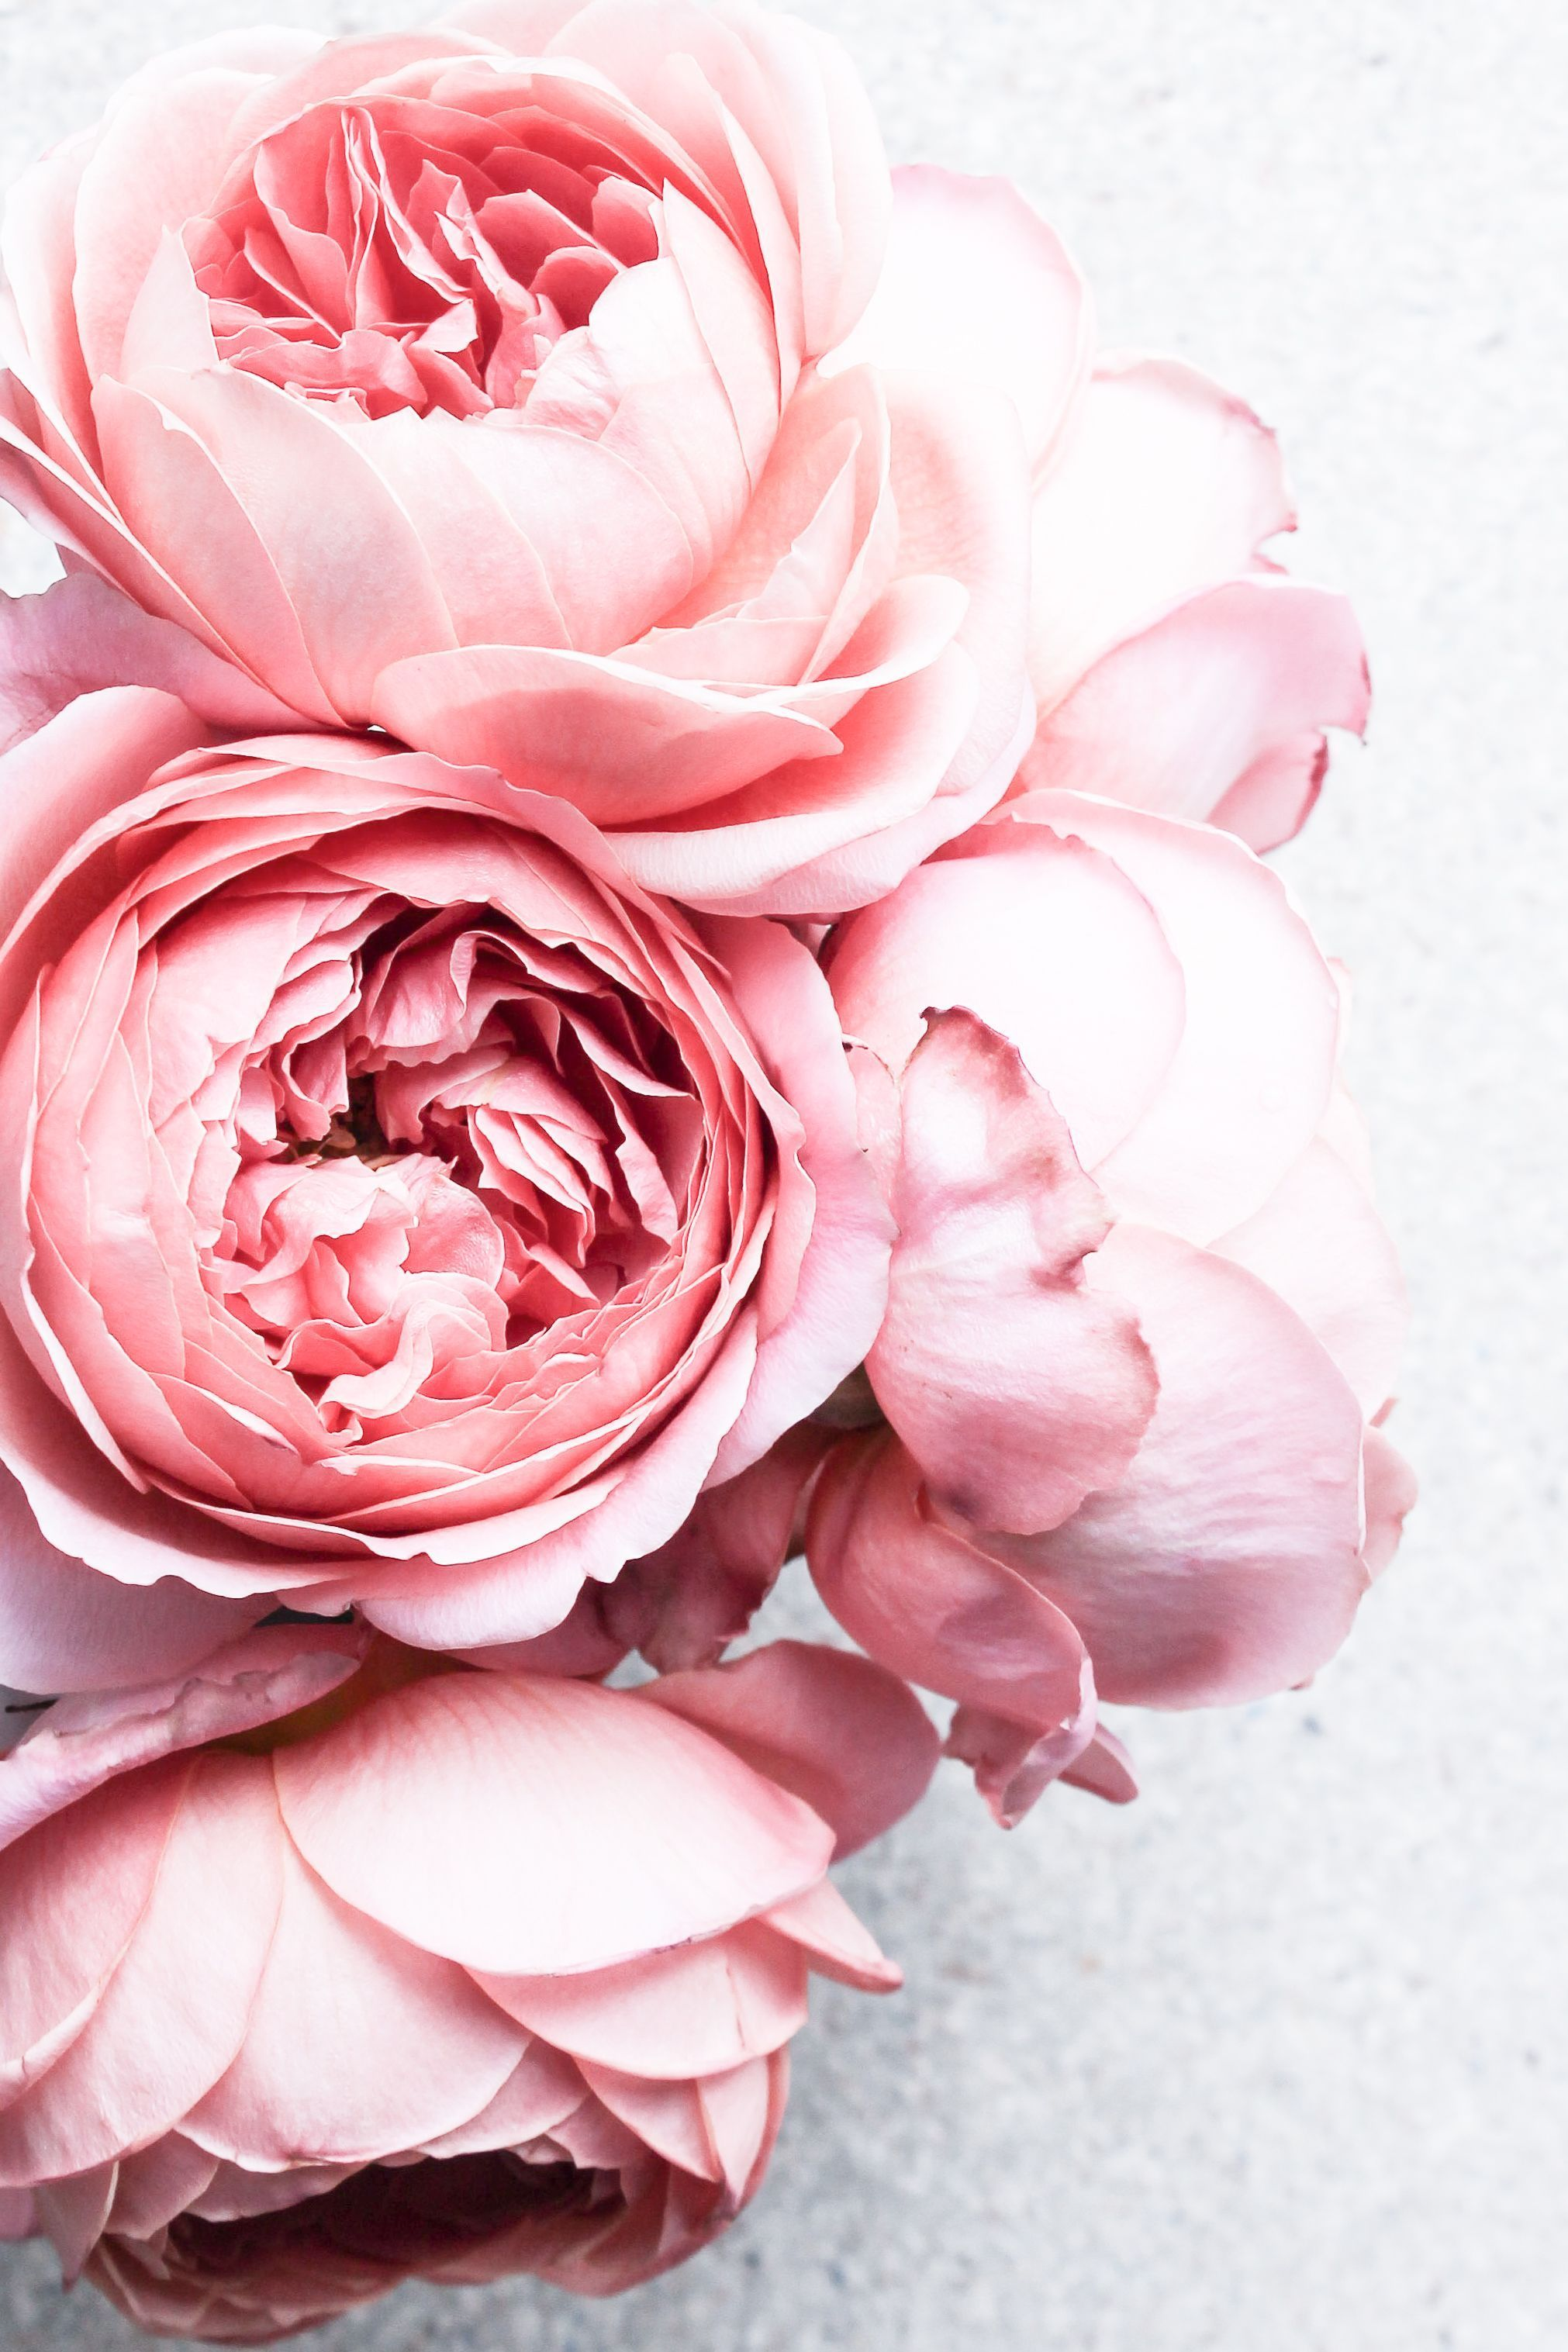 25 Beautiful Flowers In The World Minimalist House Ideas